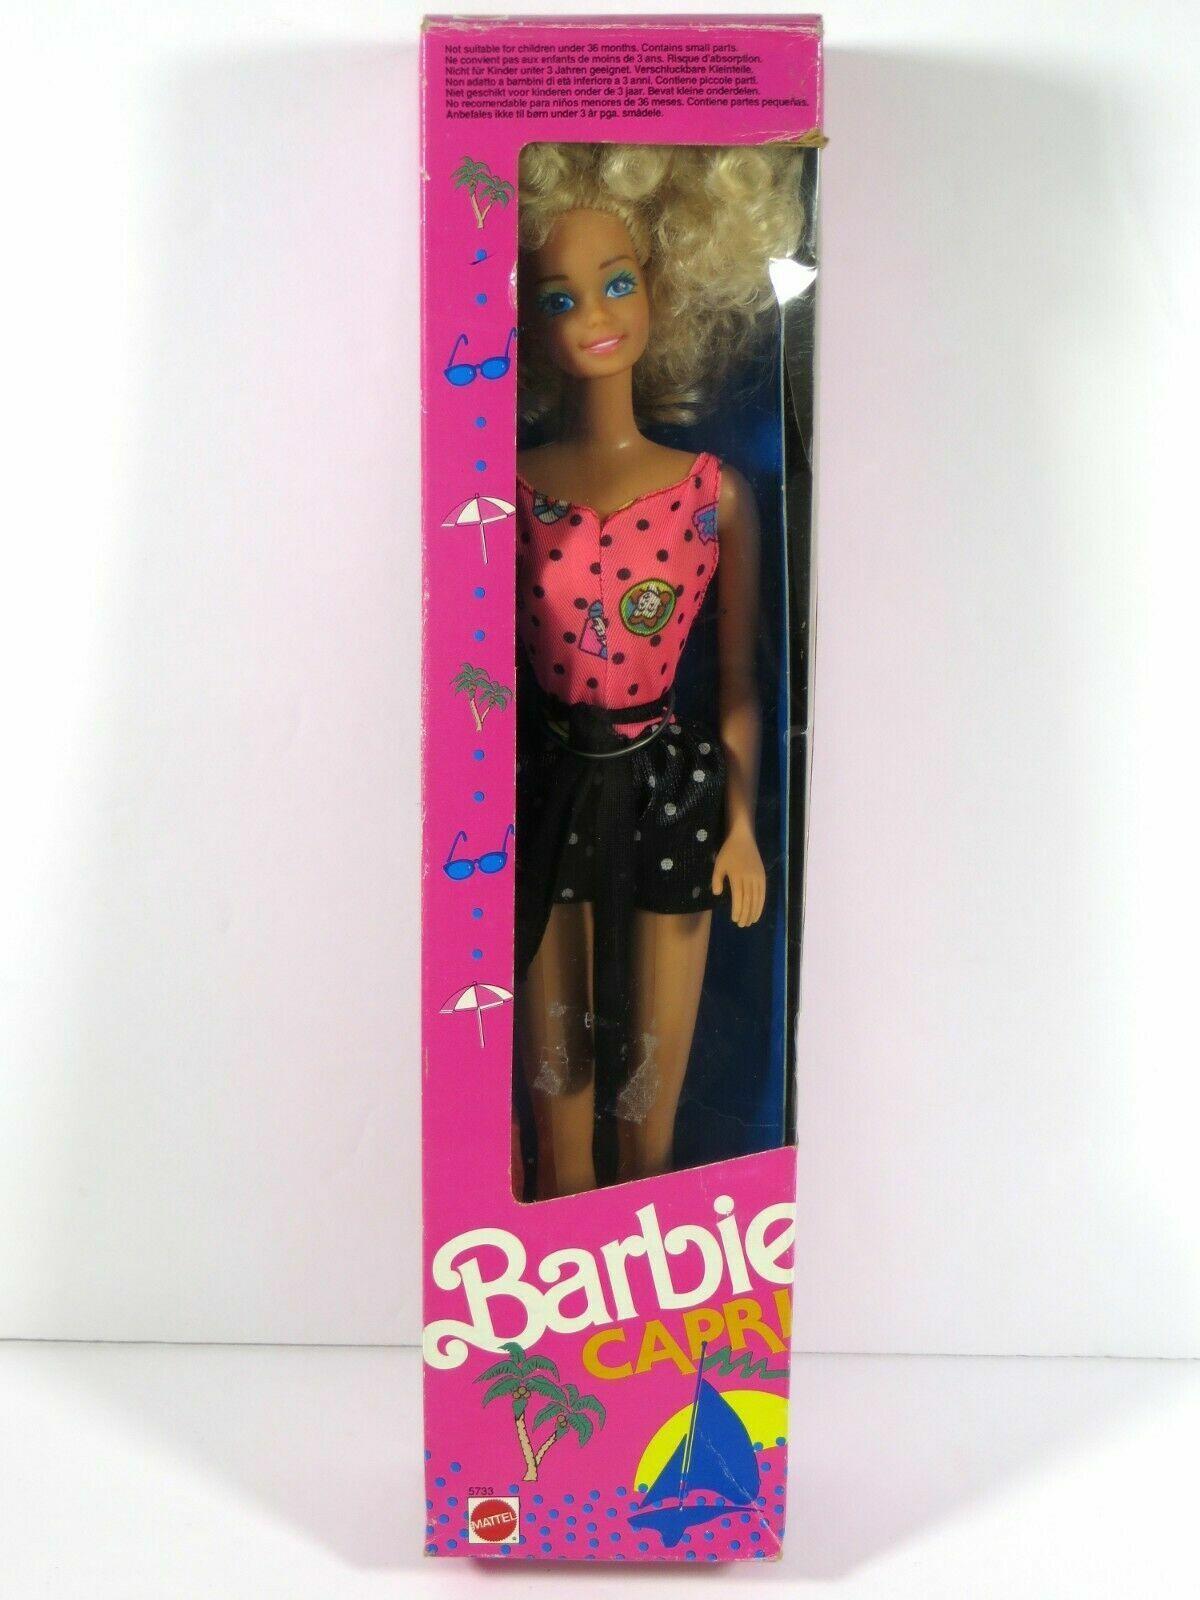 BARBIE ORGINAL 1990 MATTEL BARBIE Capri OVP VINTAGE DA COLLEZIONE COLLEZIONE COLLEZIONE 35c23d